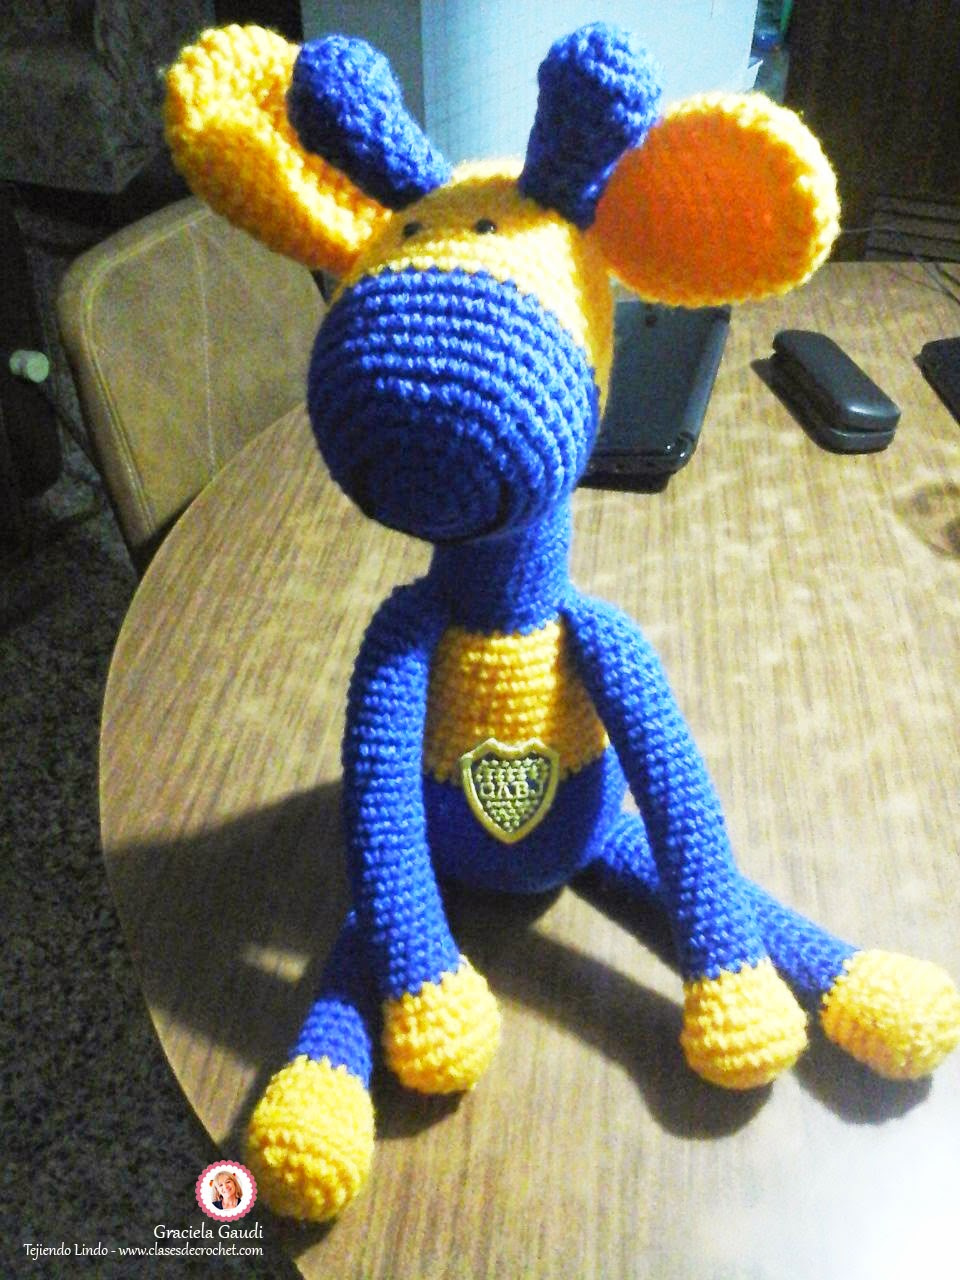 clases crochet, amigurumis, jirafa crochet